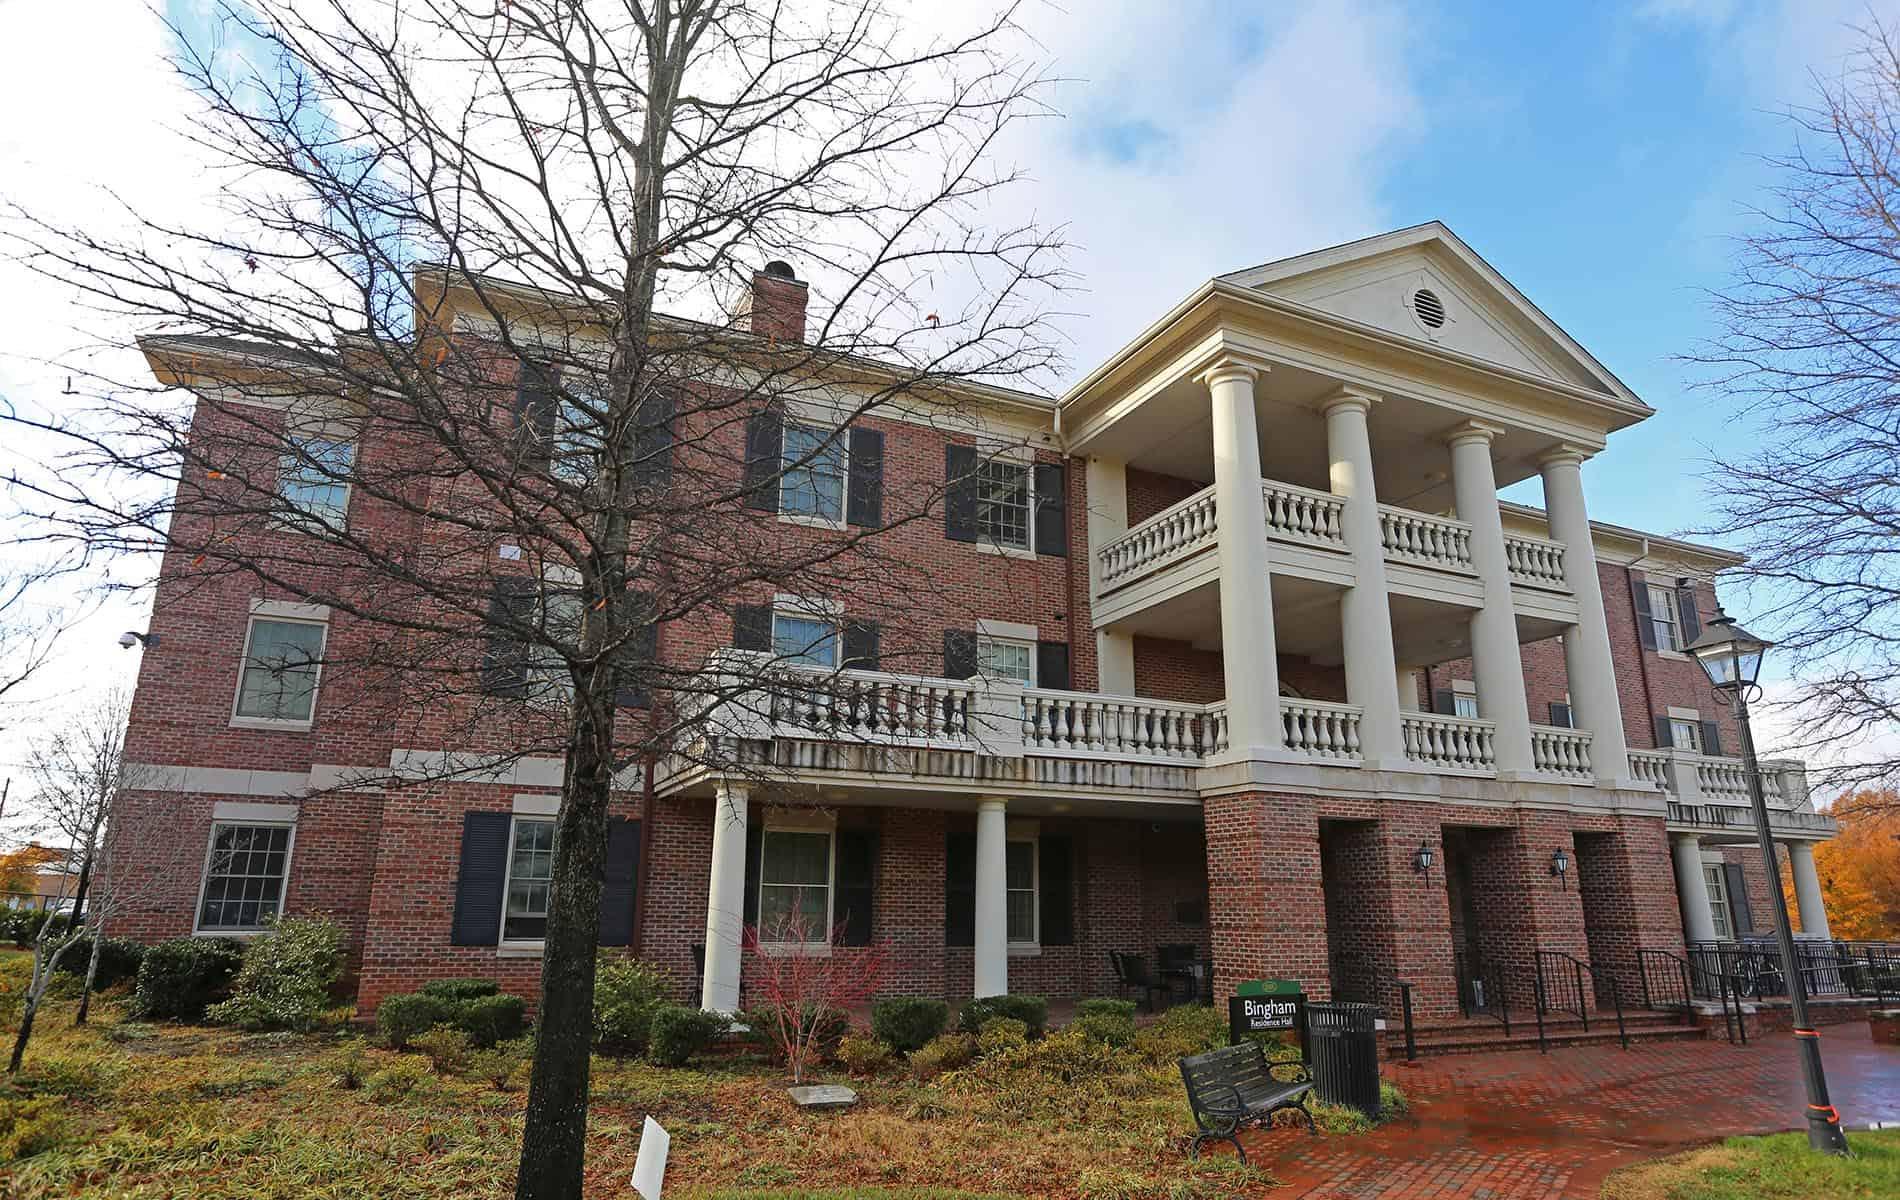 Bingham Residence Hall